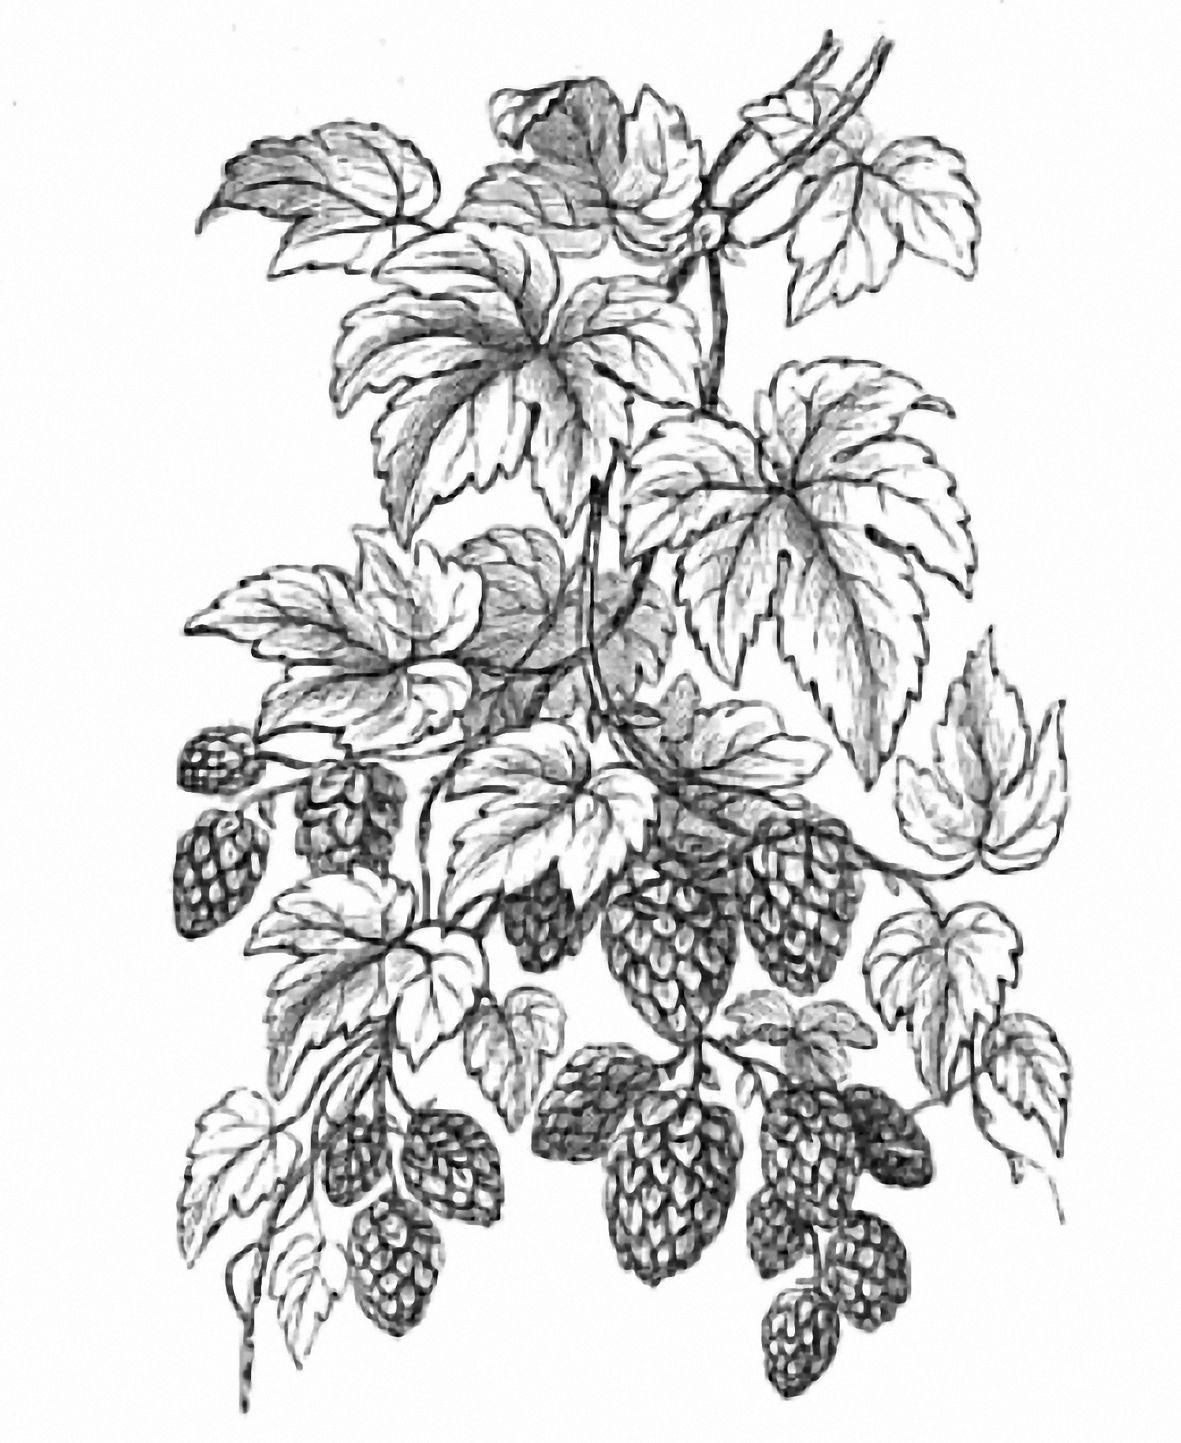 medium resolution of hop line drawing